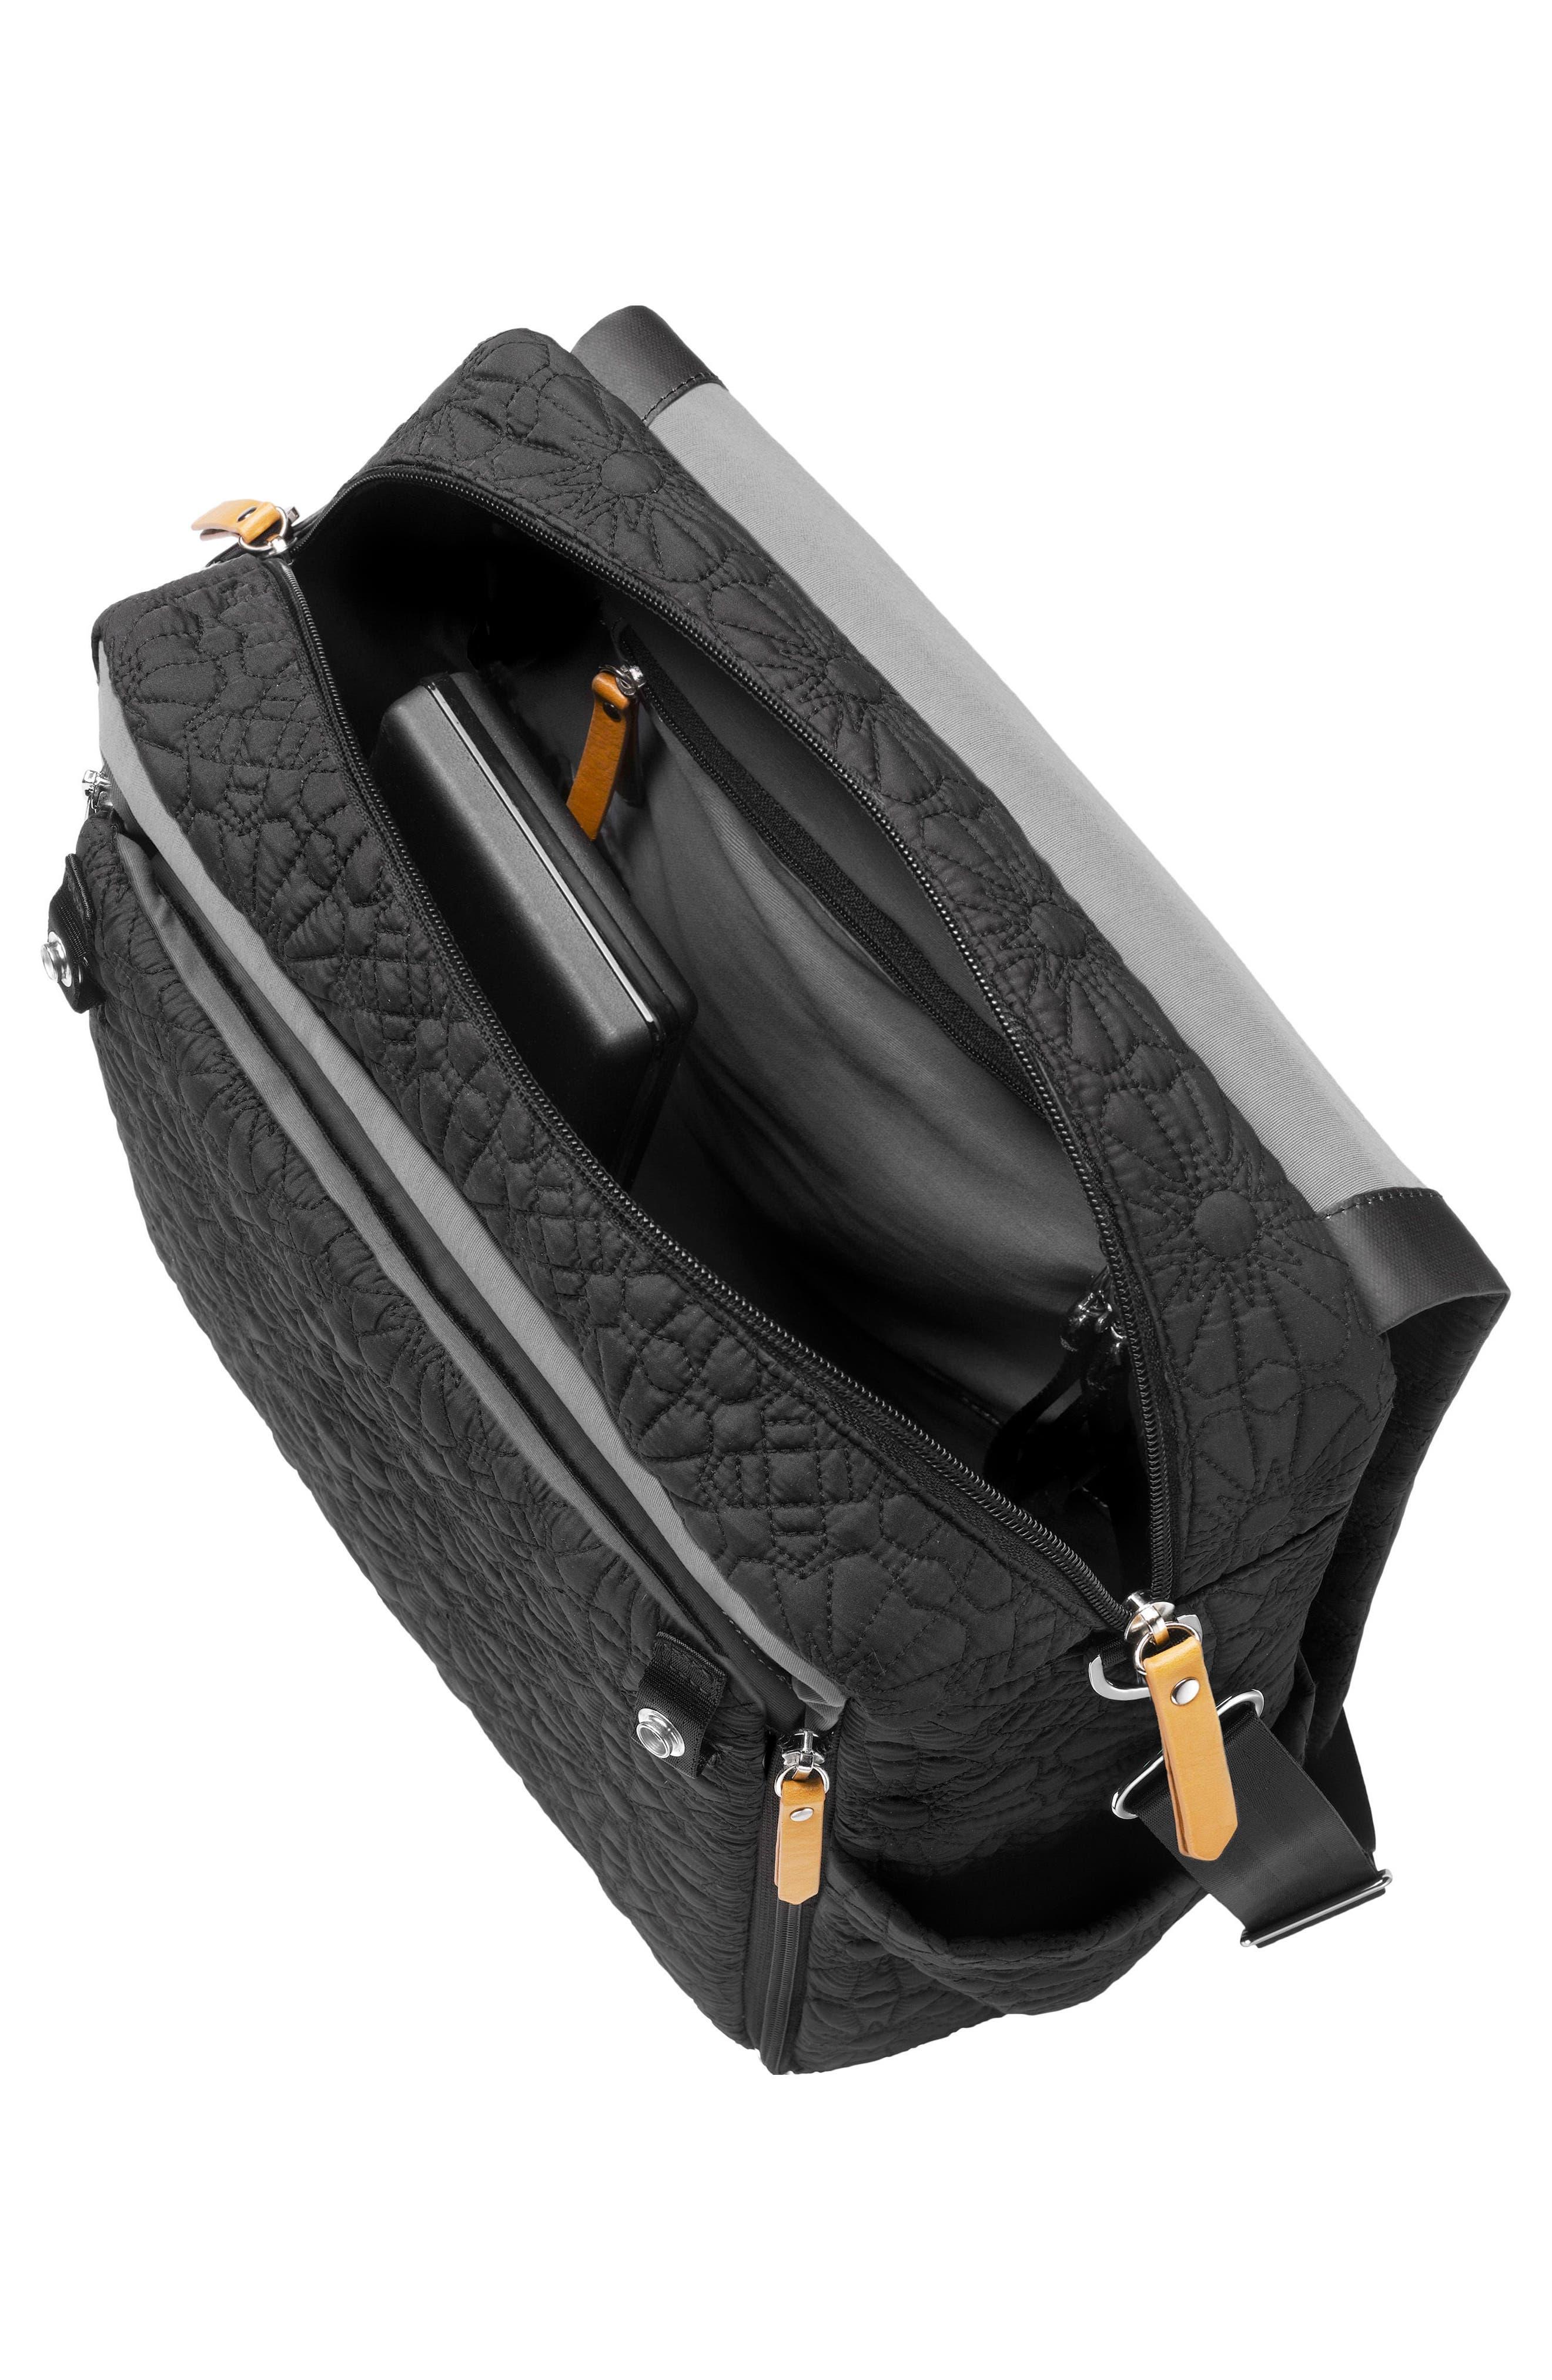 'Embossed Boxy' Backpack Diaper Bag,                             Alternate thumbnail 4, color,                             002